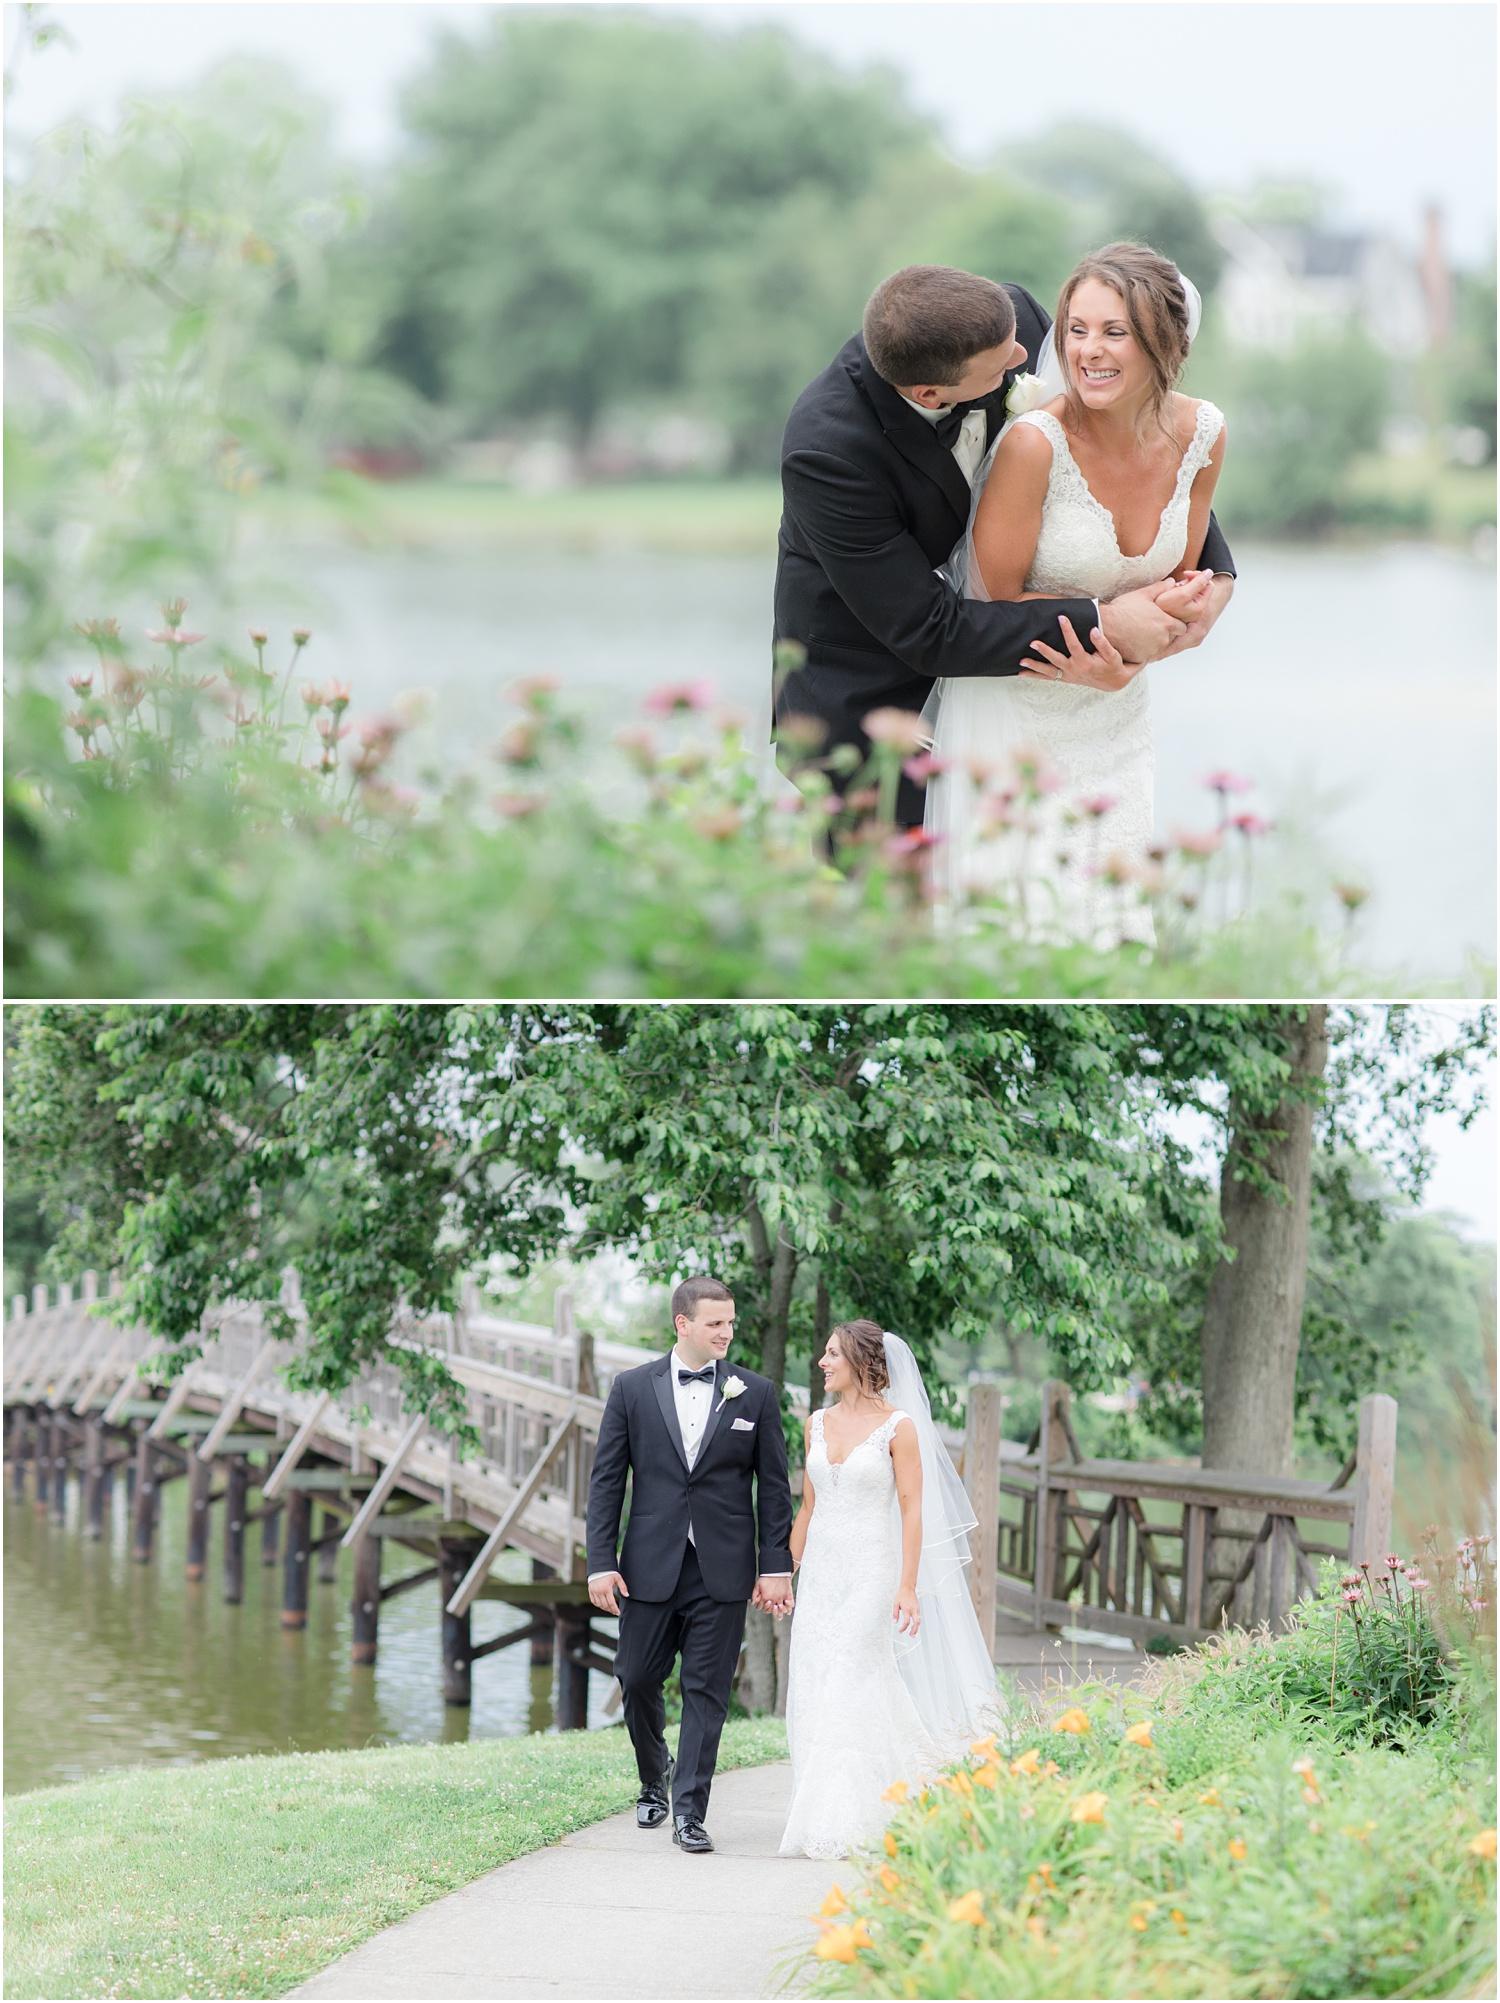 fun wedding photos at Divine Park in Spring Lake